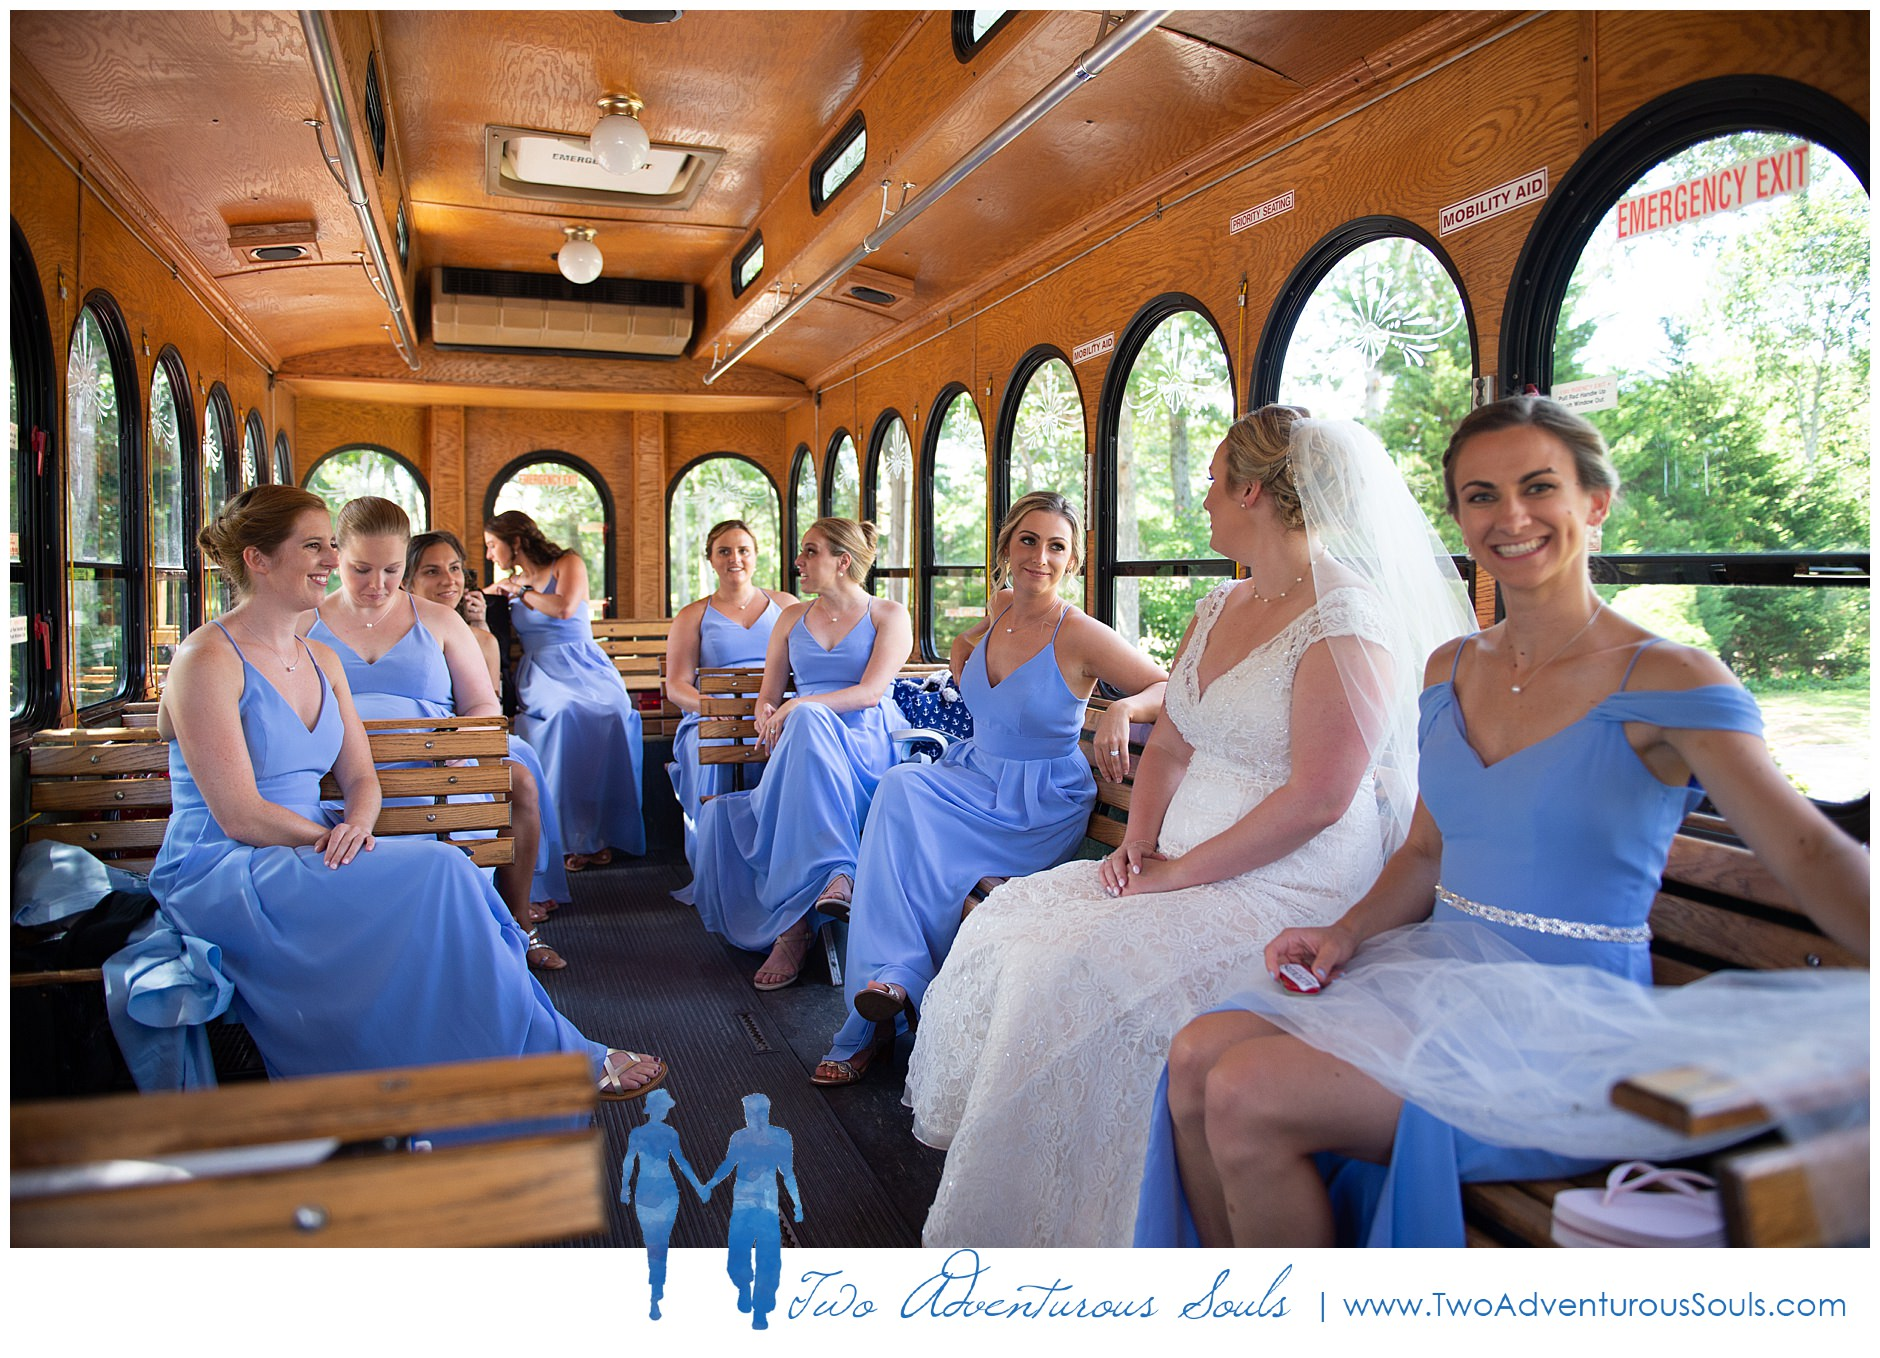 Cape Cod Wedding Photographers, Destination Wedding Photographers, Two Adventurous Souls-081019_0016.jpg